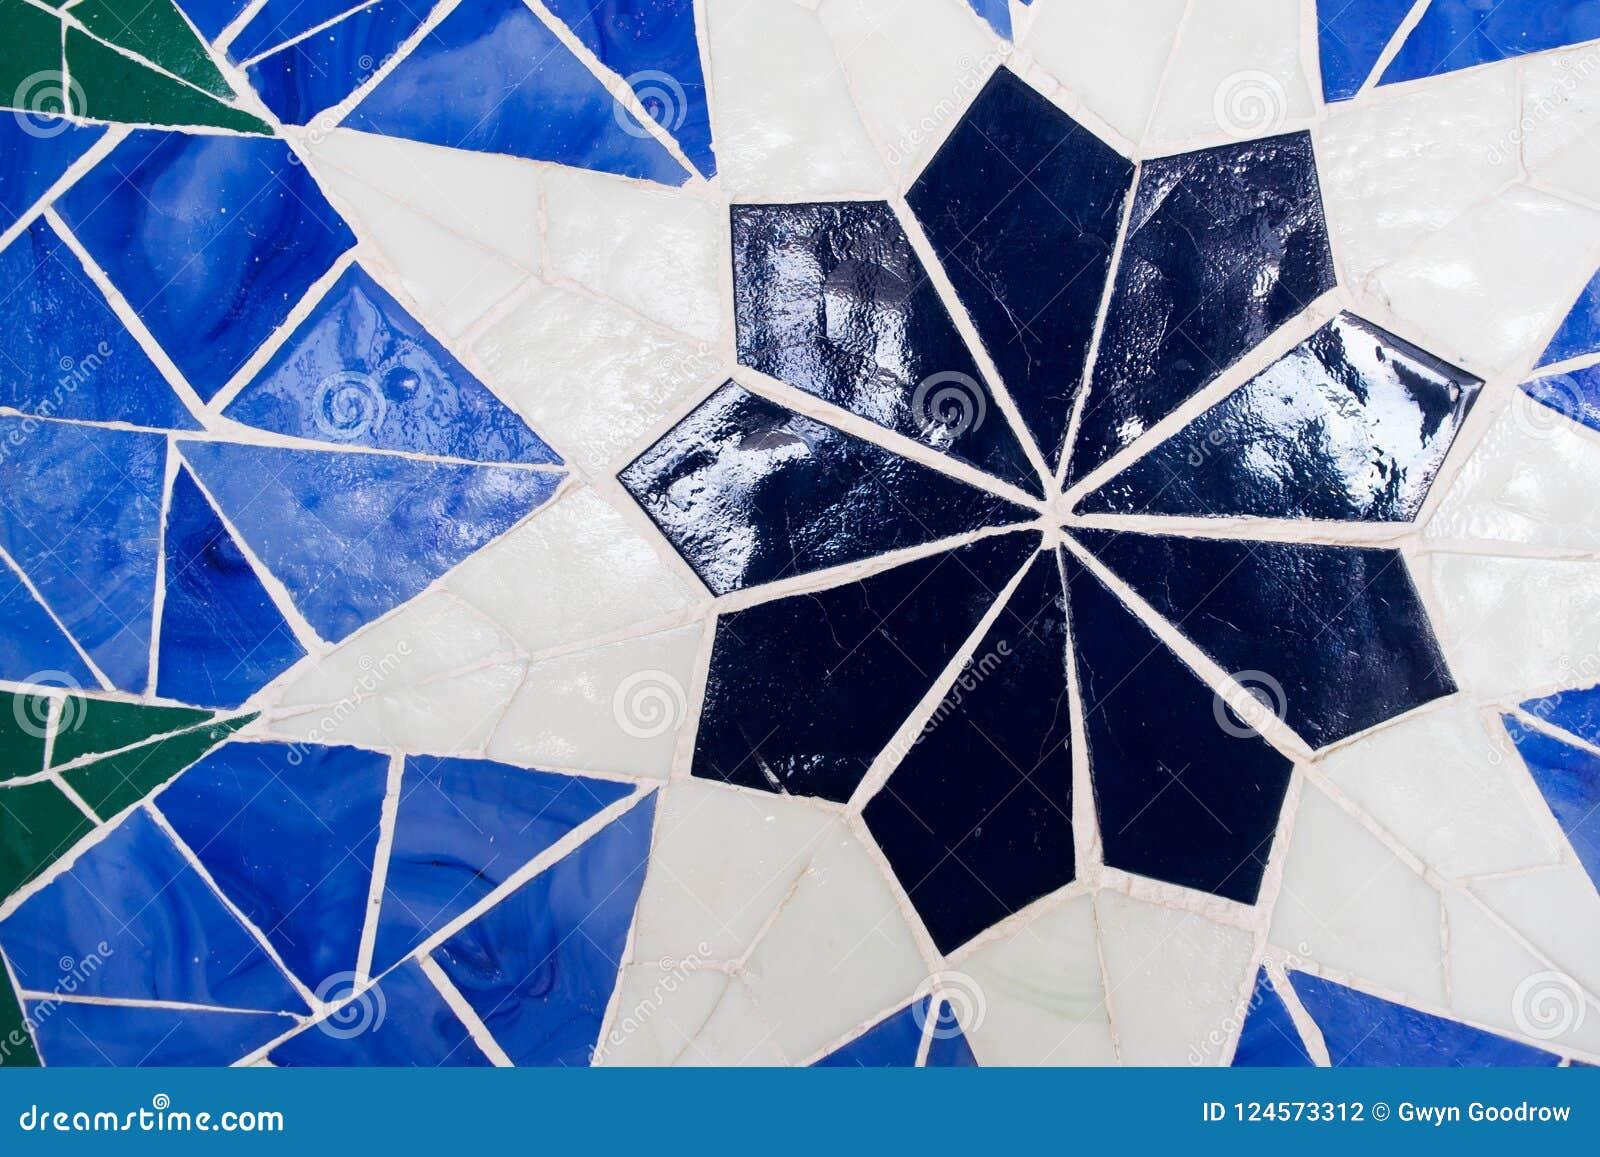 Vivid blue kaleidoscope background. Painted geometric pattern.